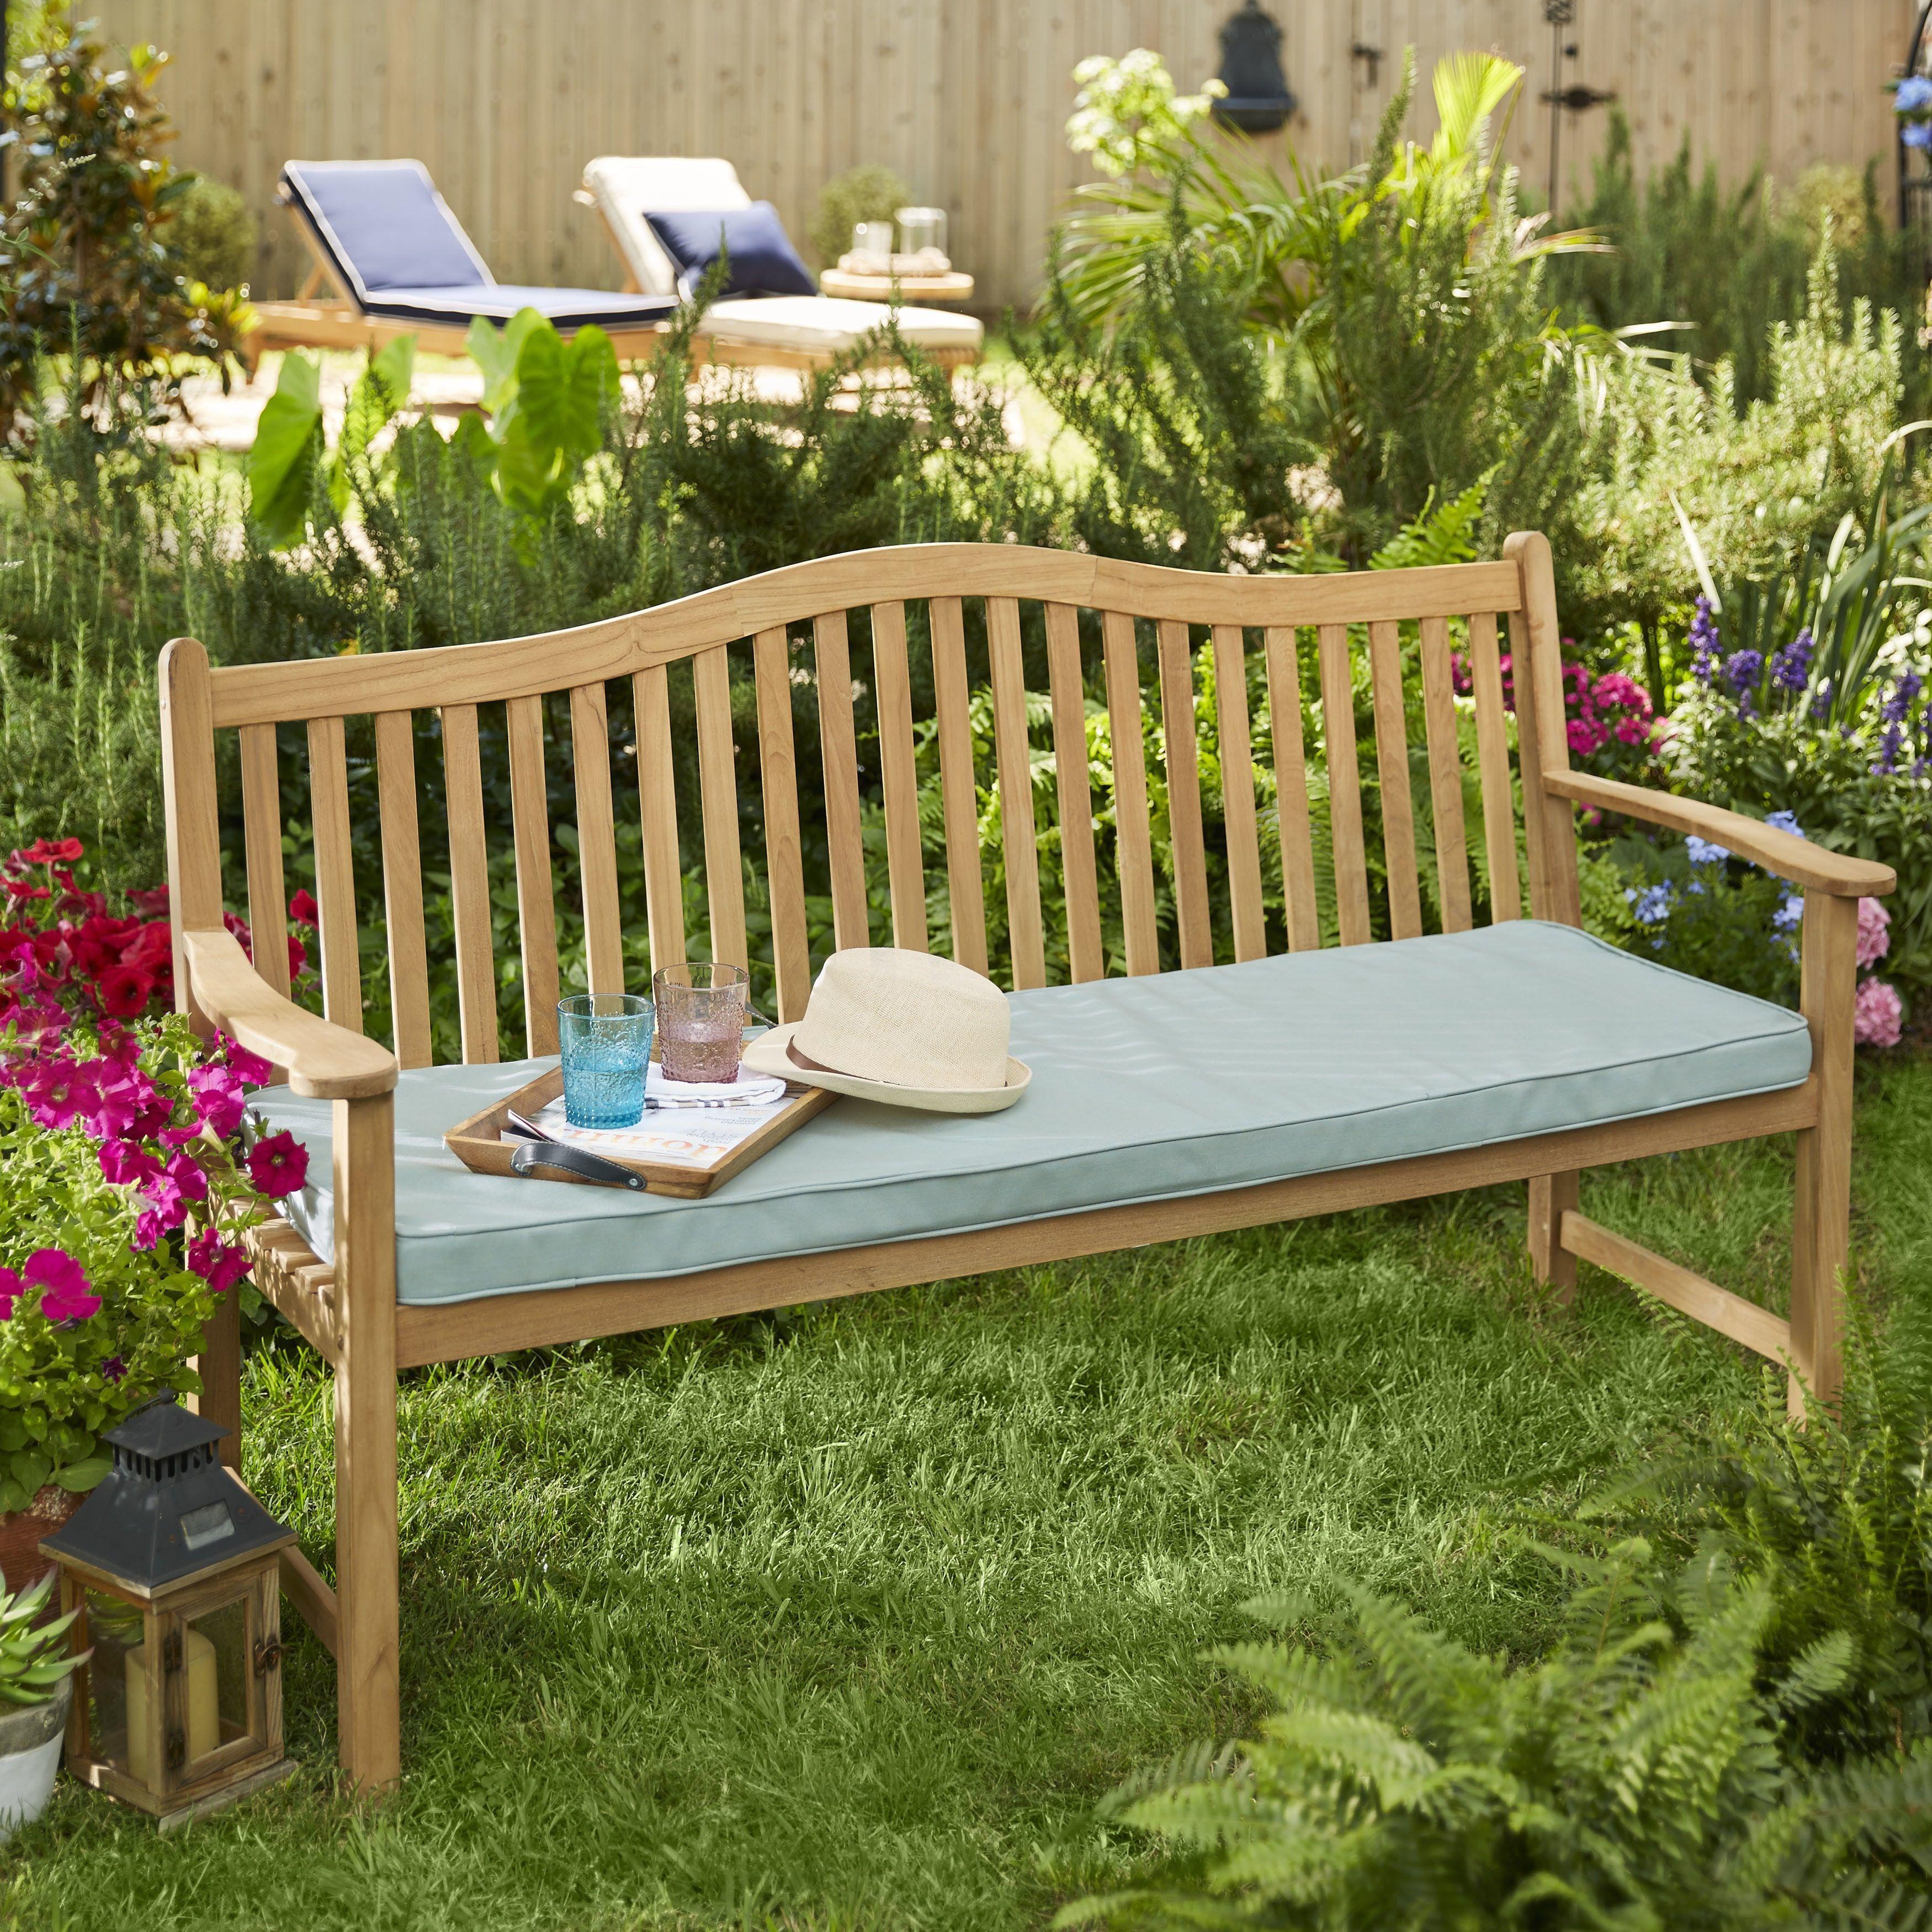 Cottage Teak Bench Cushion With Sunbrella Fabric Navy Modern